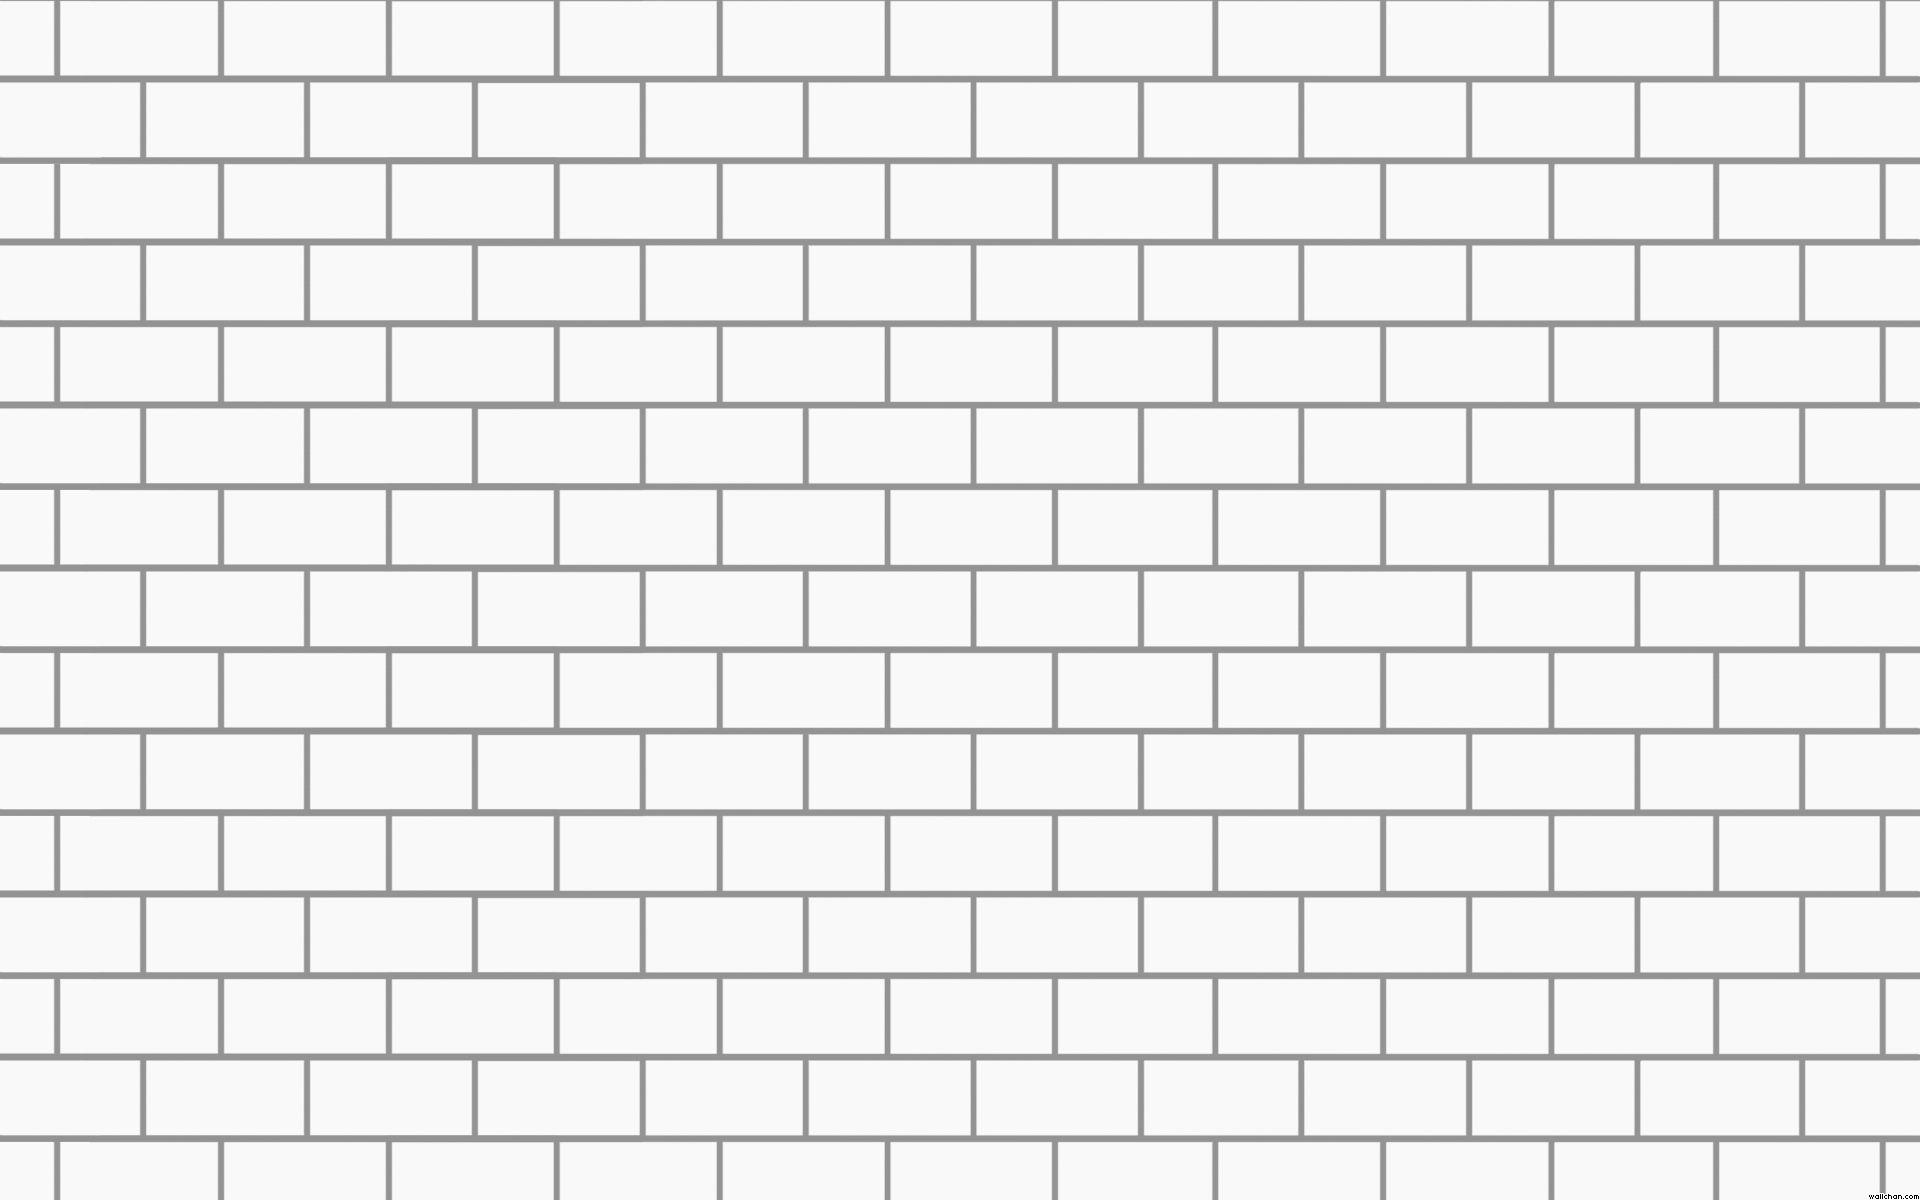 Brick Coloring Pages | bugga | Pinterest | Bricks, Sunday school ...